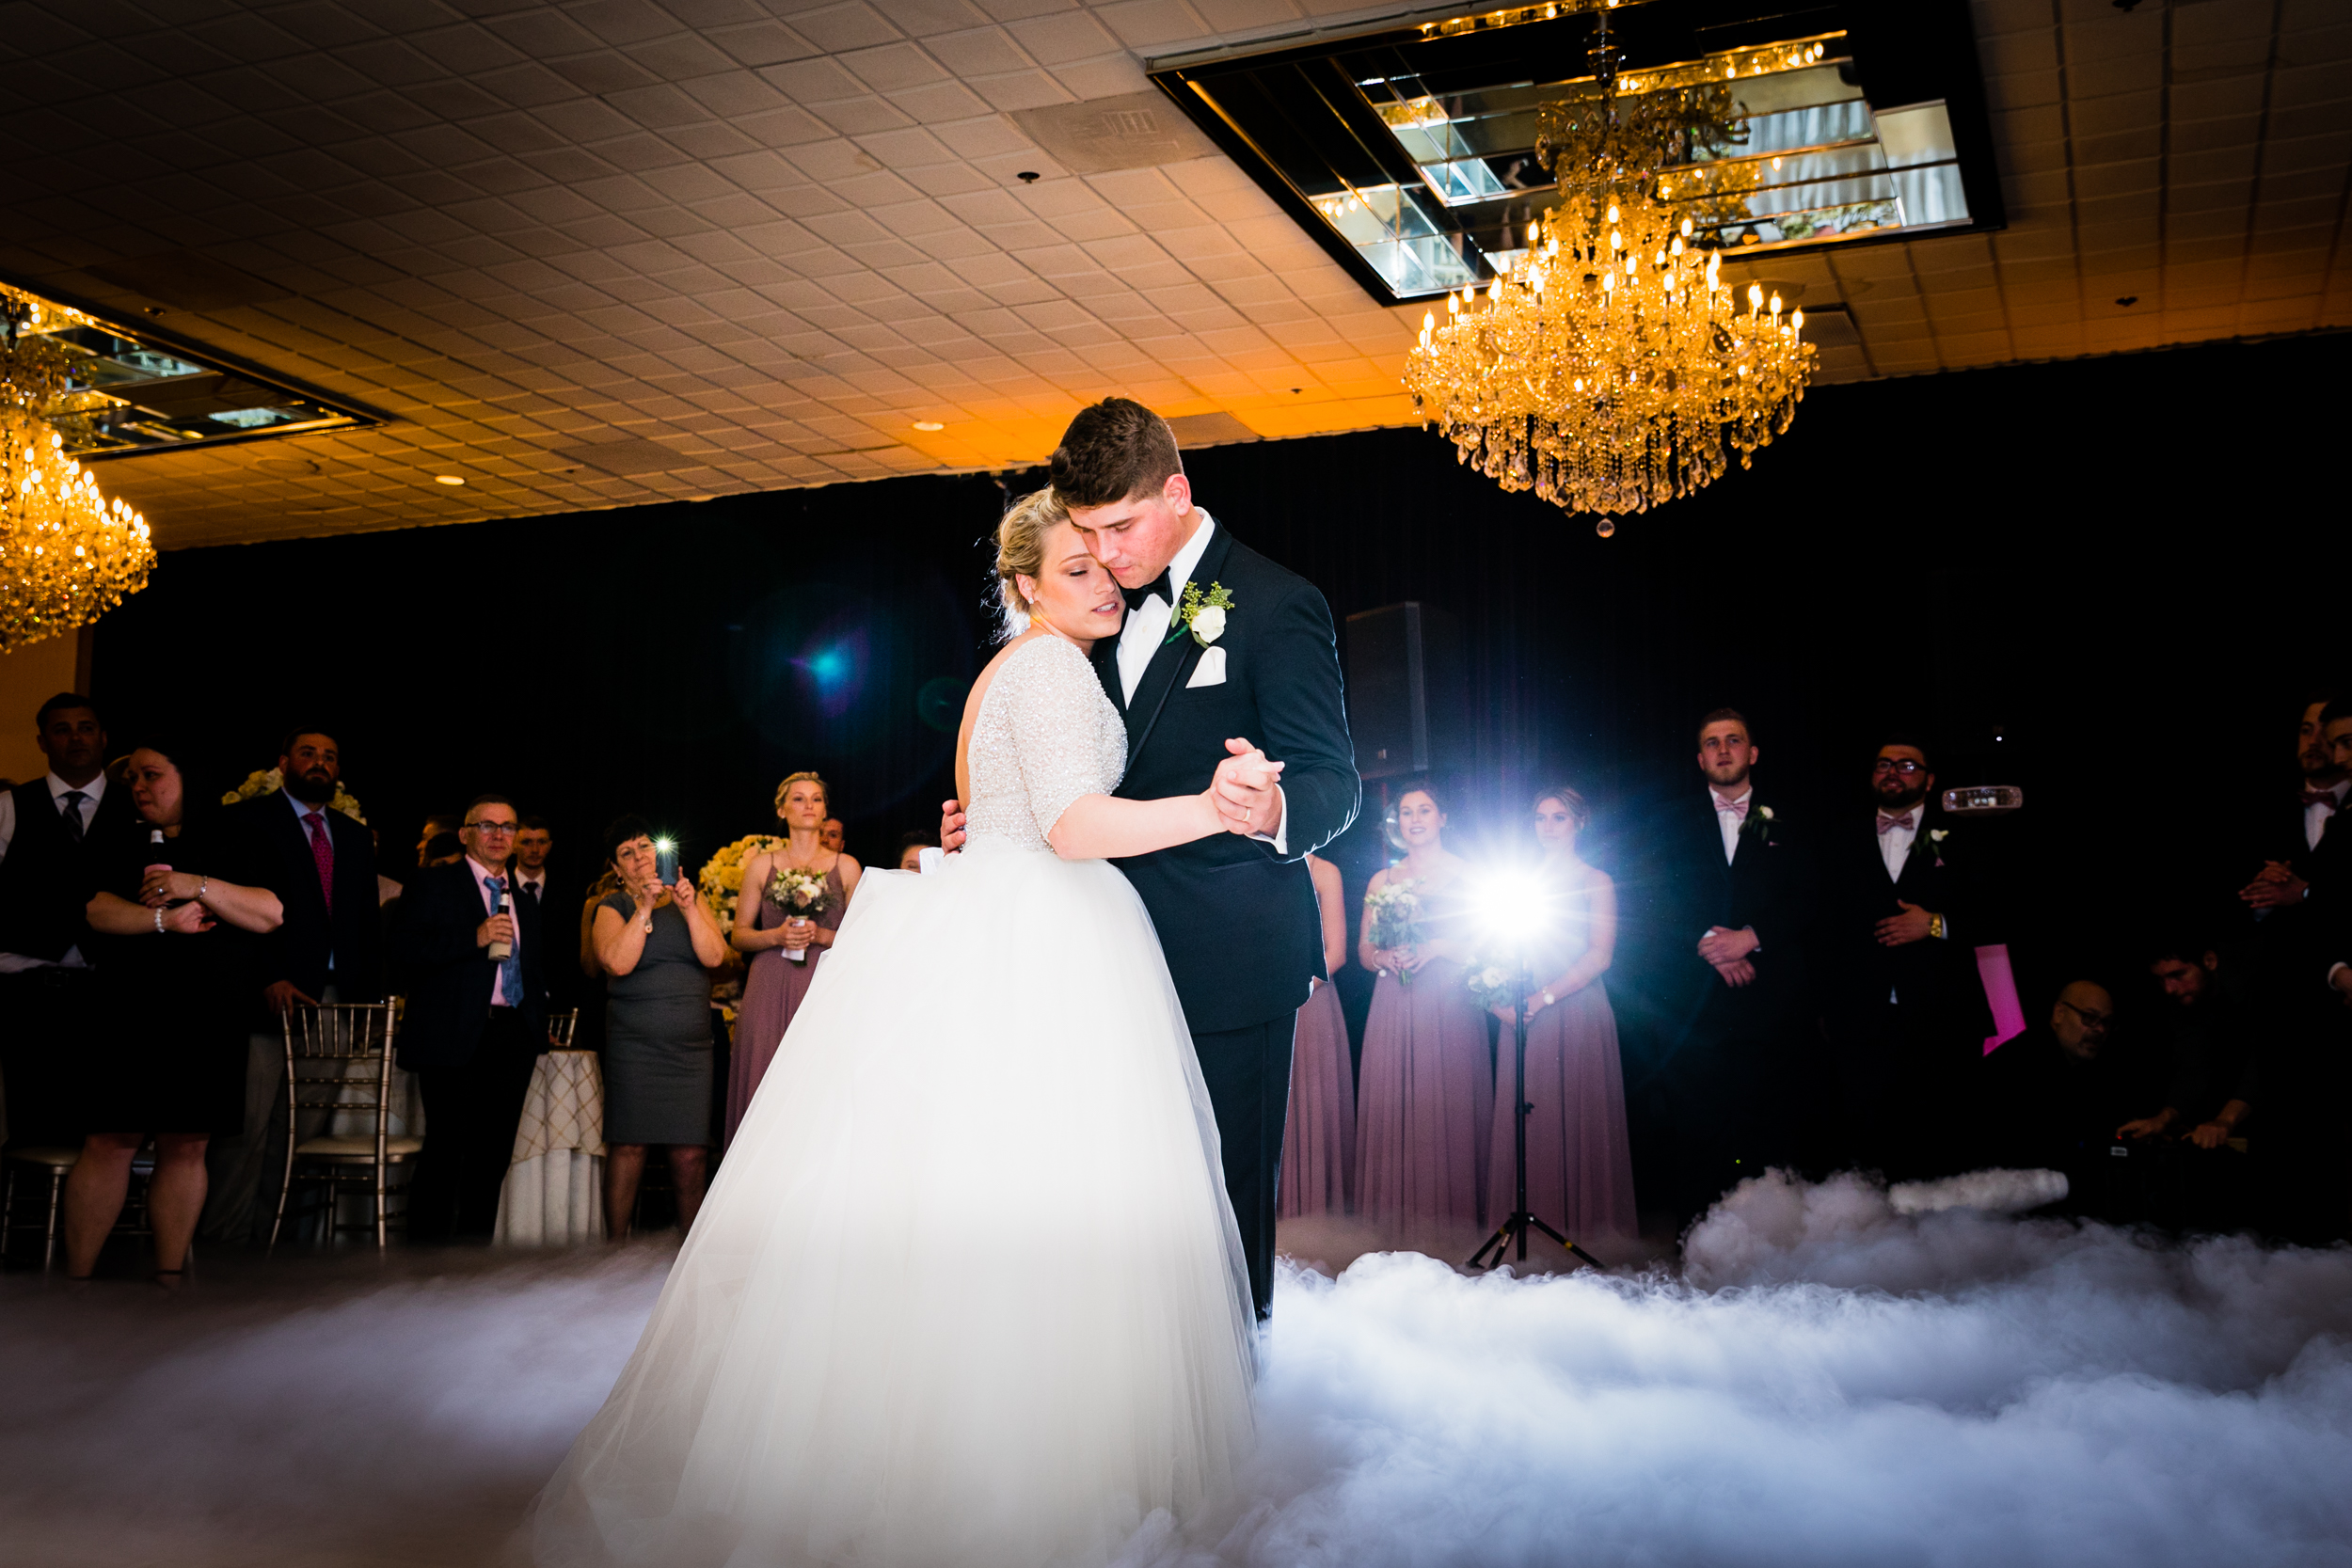 CELEBRATIONS BENSALEM WEDDING PHOTOGRAPHY-81.jpg